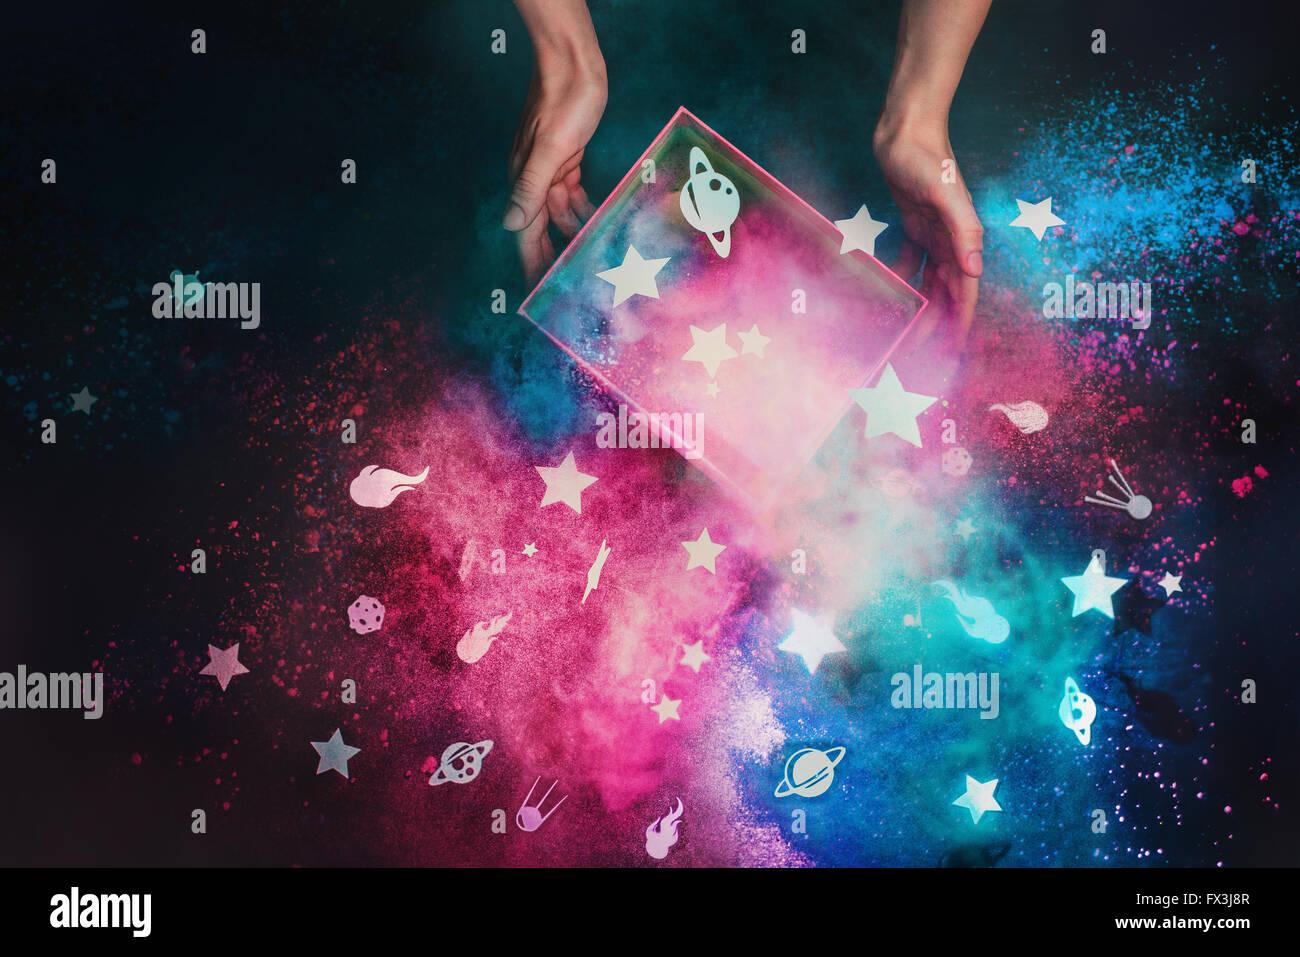 Una caja llena de estrellas Imagen De Stock